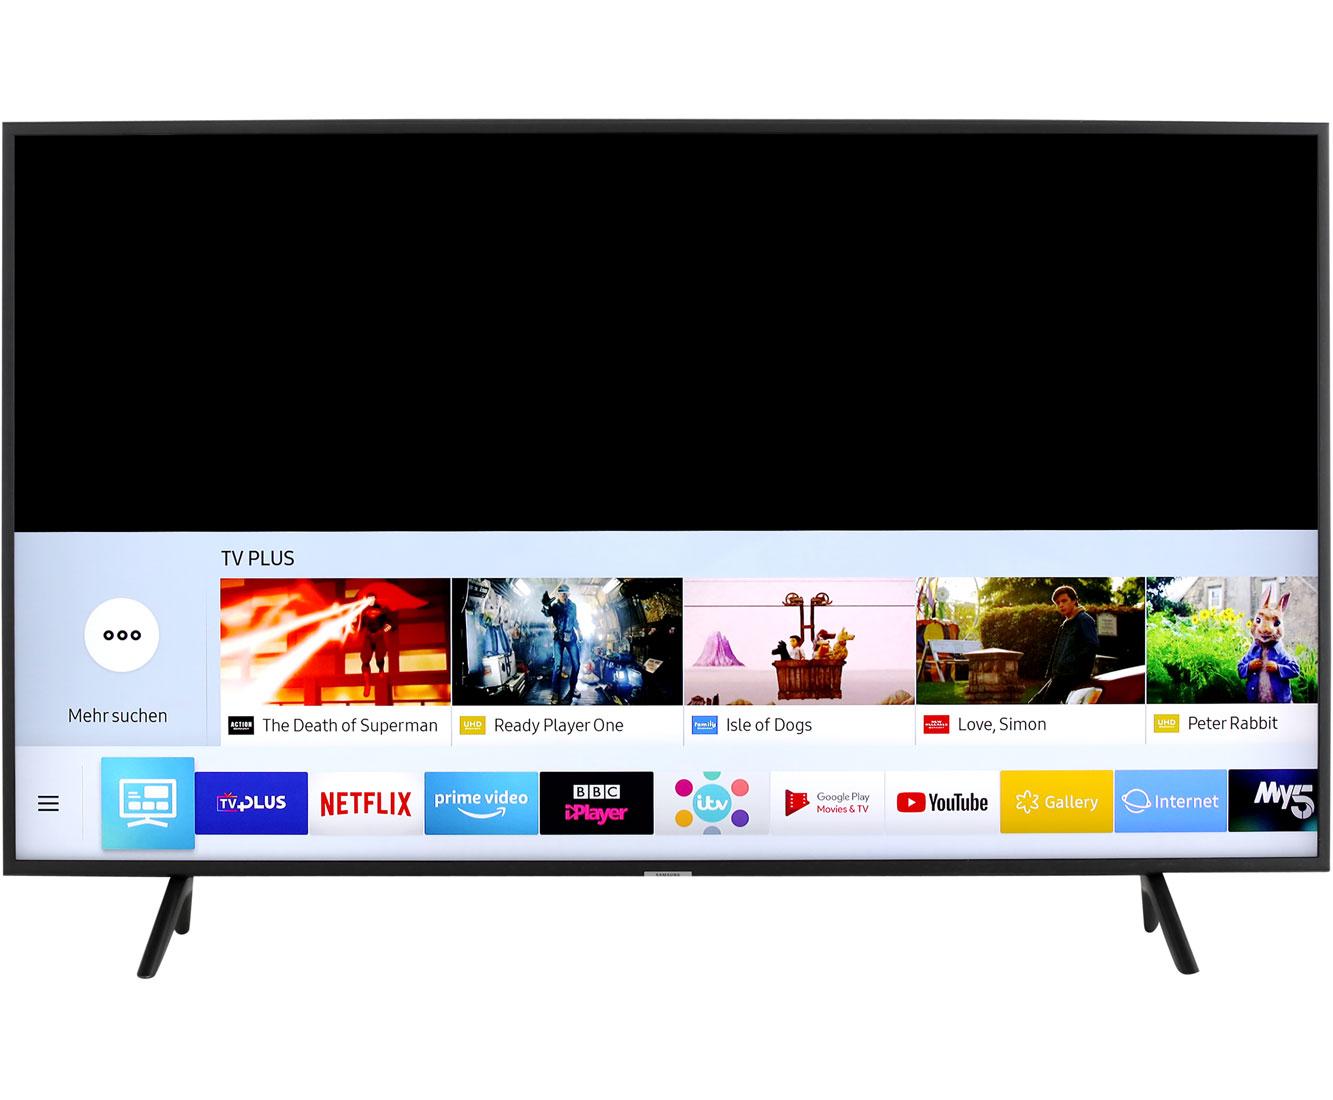 [ao.de oder Ebay] Samsung NU7179 163 cm (65 Zoll) LED Fernseher (Ultra HD, HDR, Triple Tuner, Smart TV)